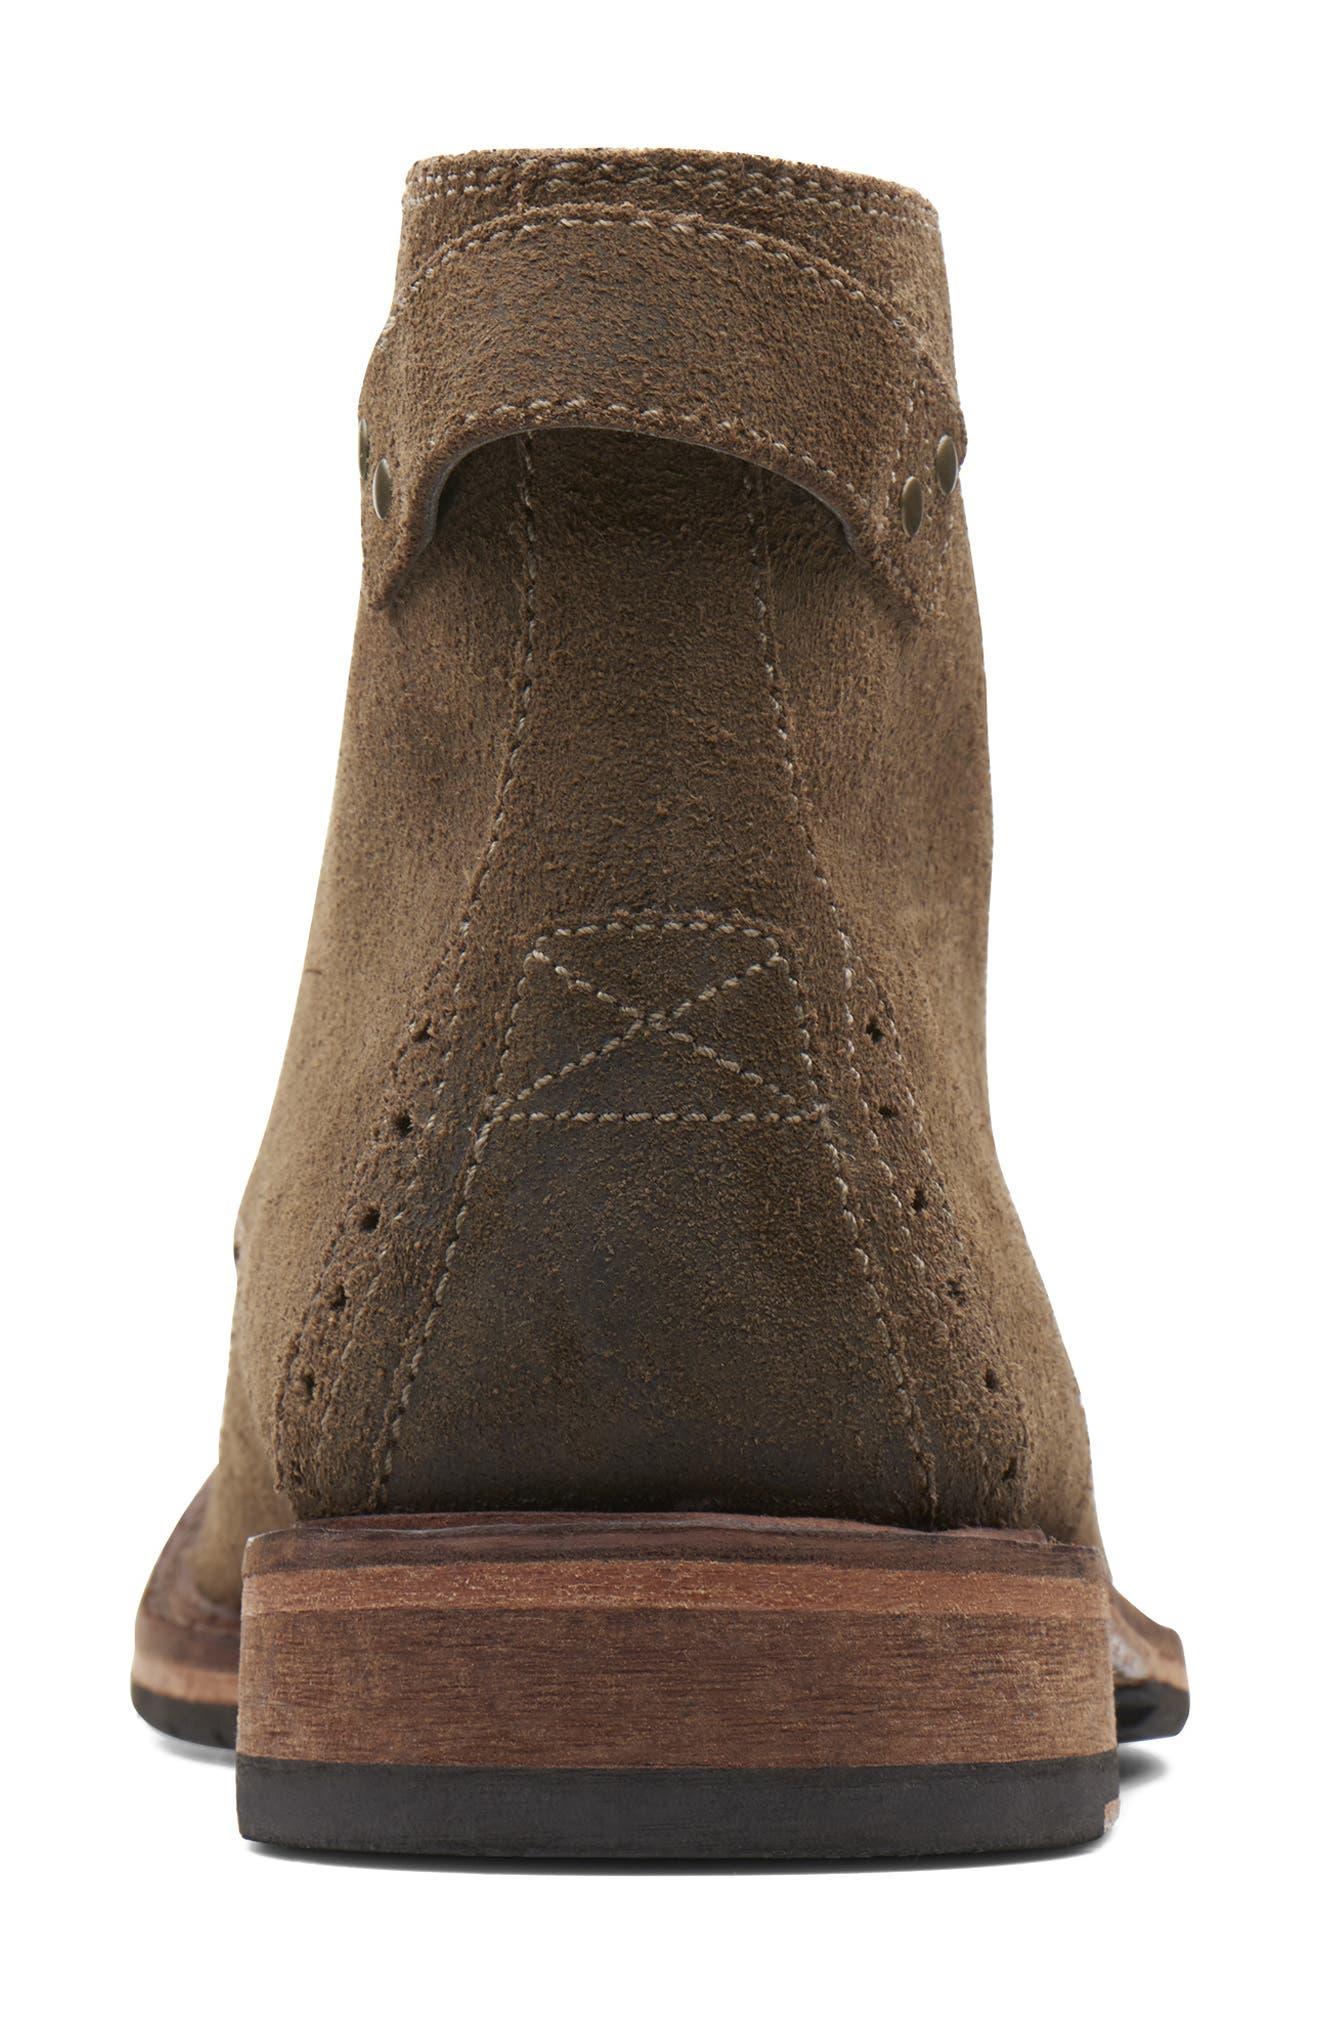 Clarkdale Bud Plain Toe Boot,                             Alternate thumbnail 4, color,                             KHAKI SUEDE